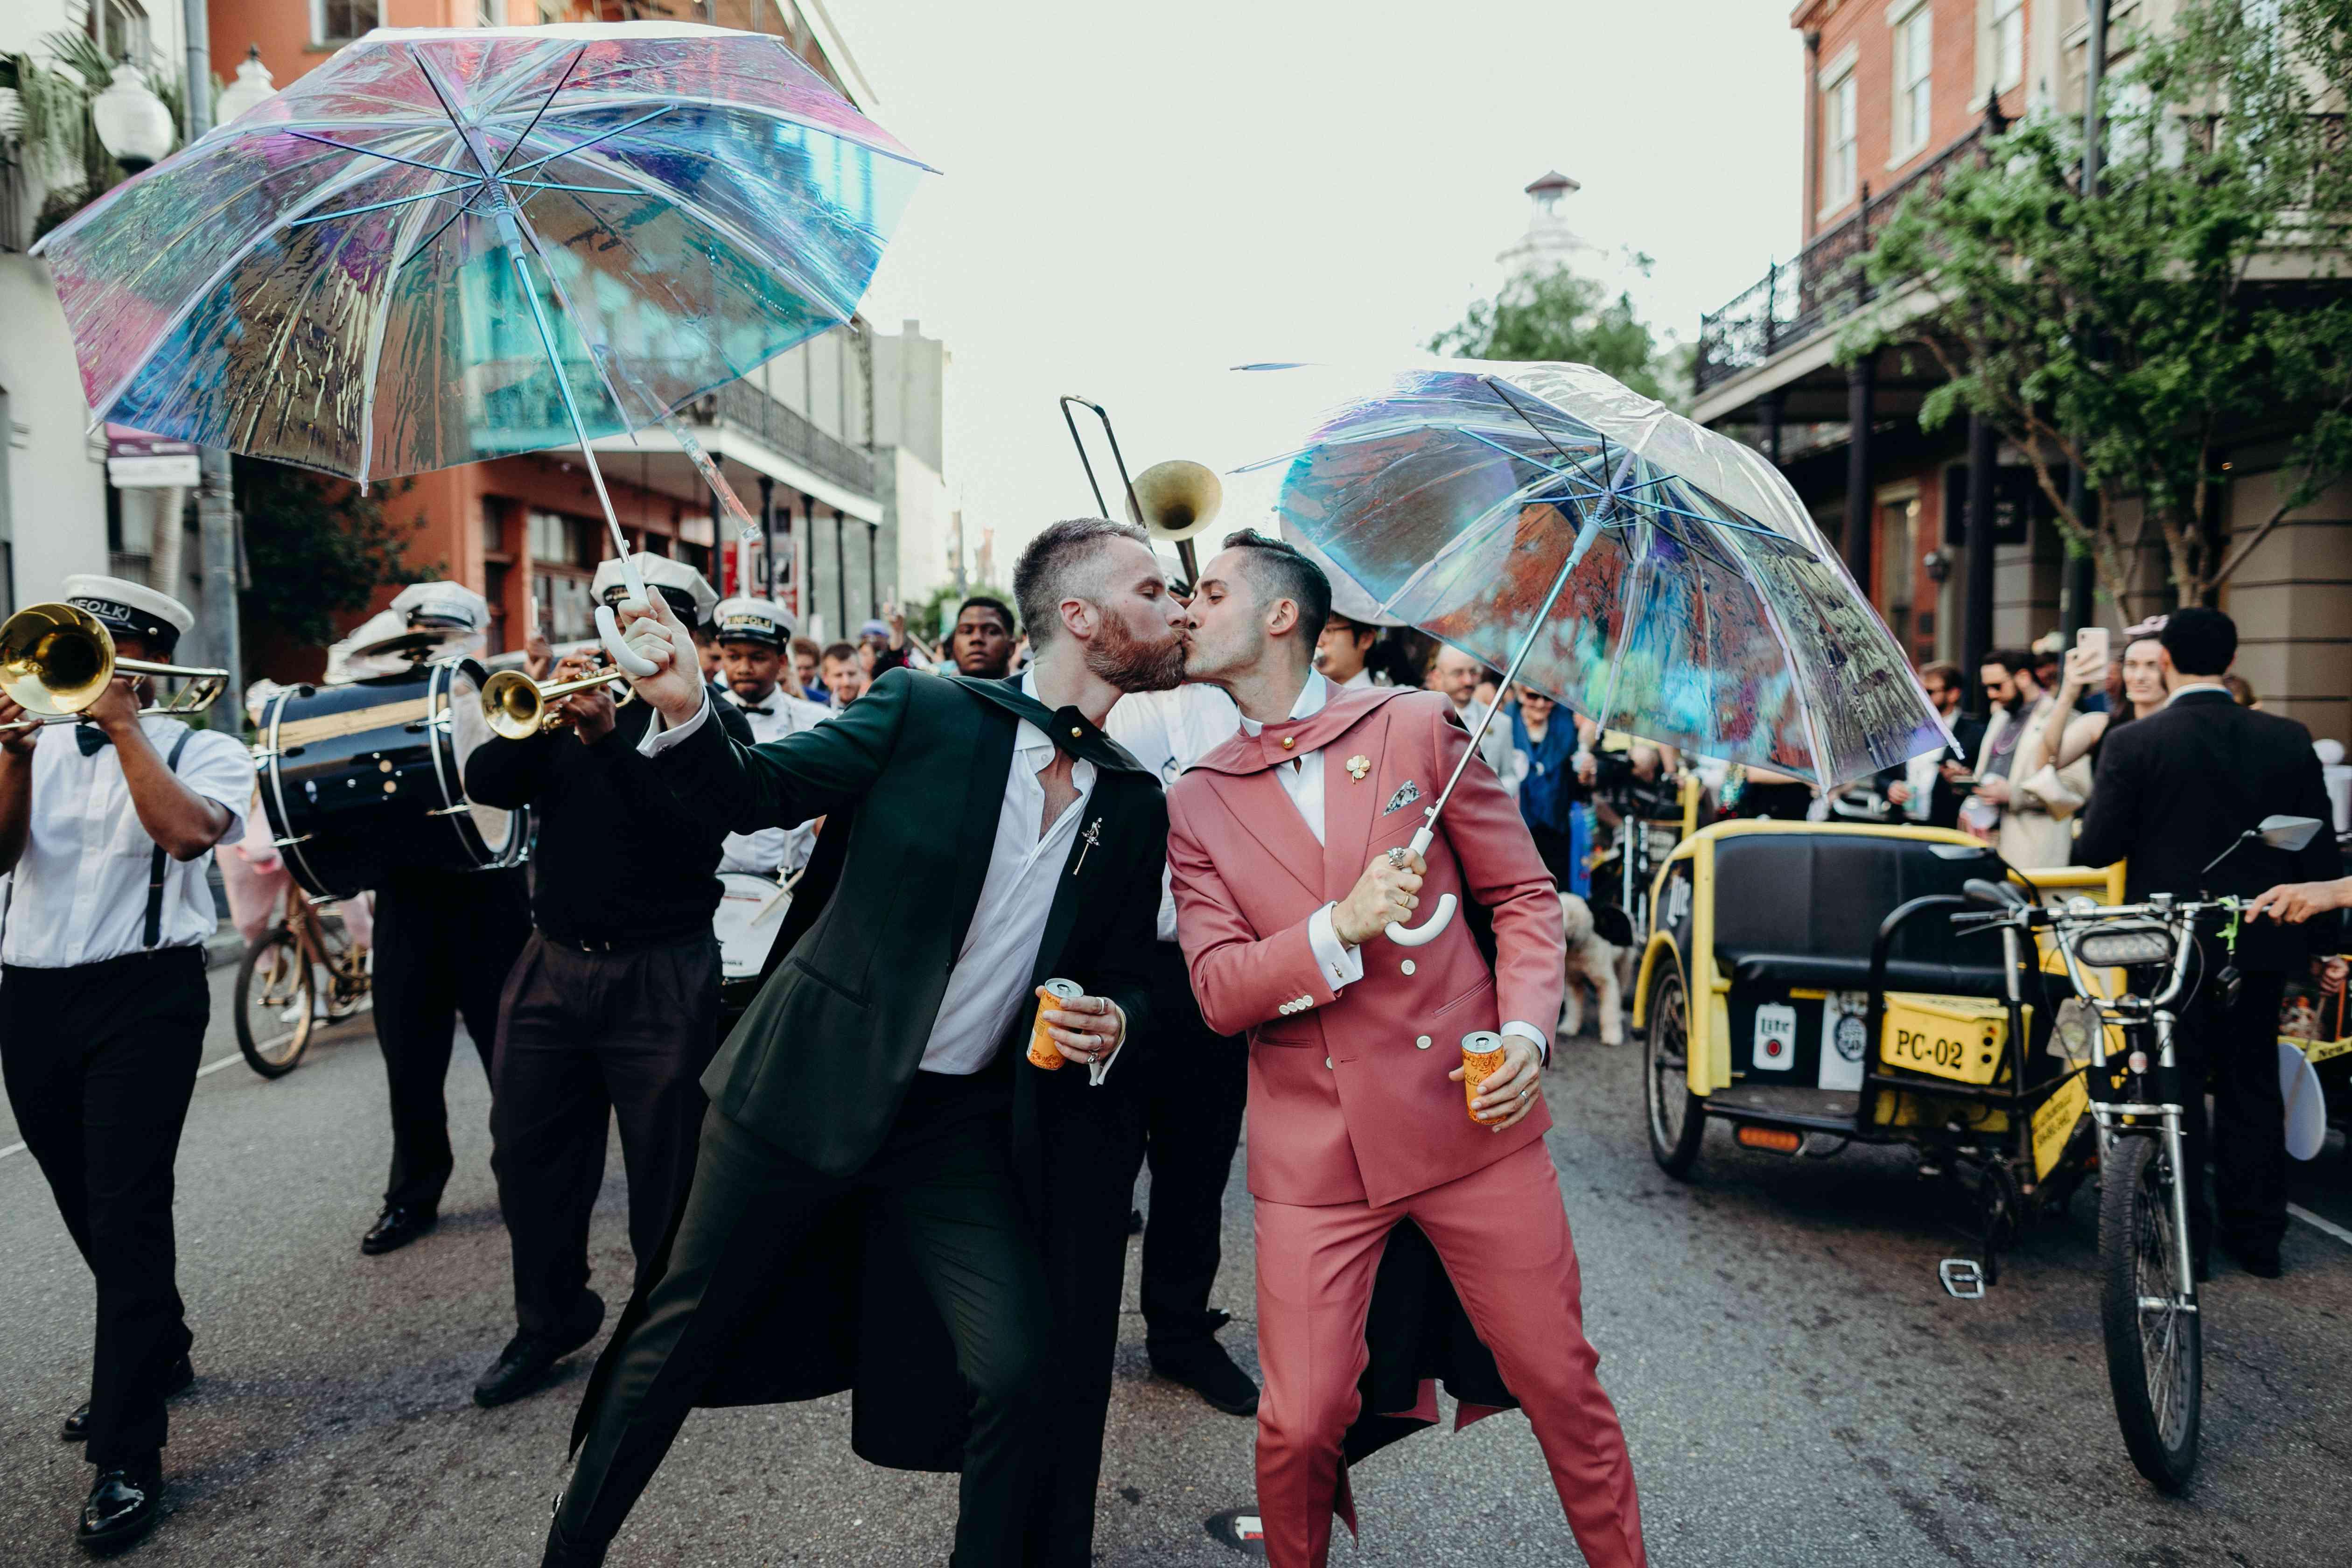 gay couple kissing during second parade at wedding